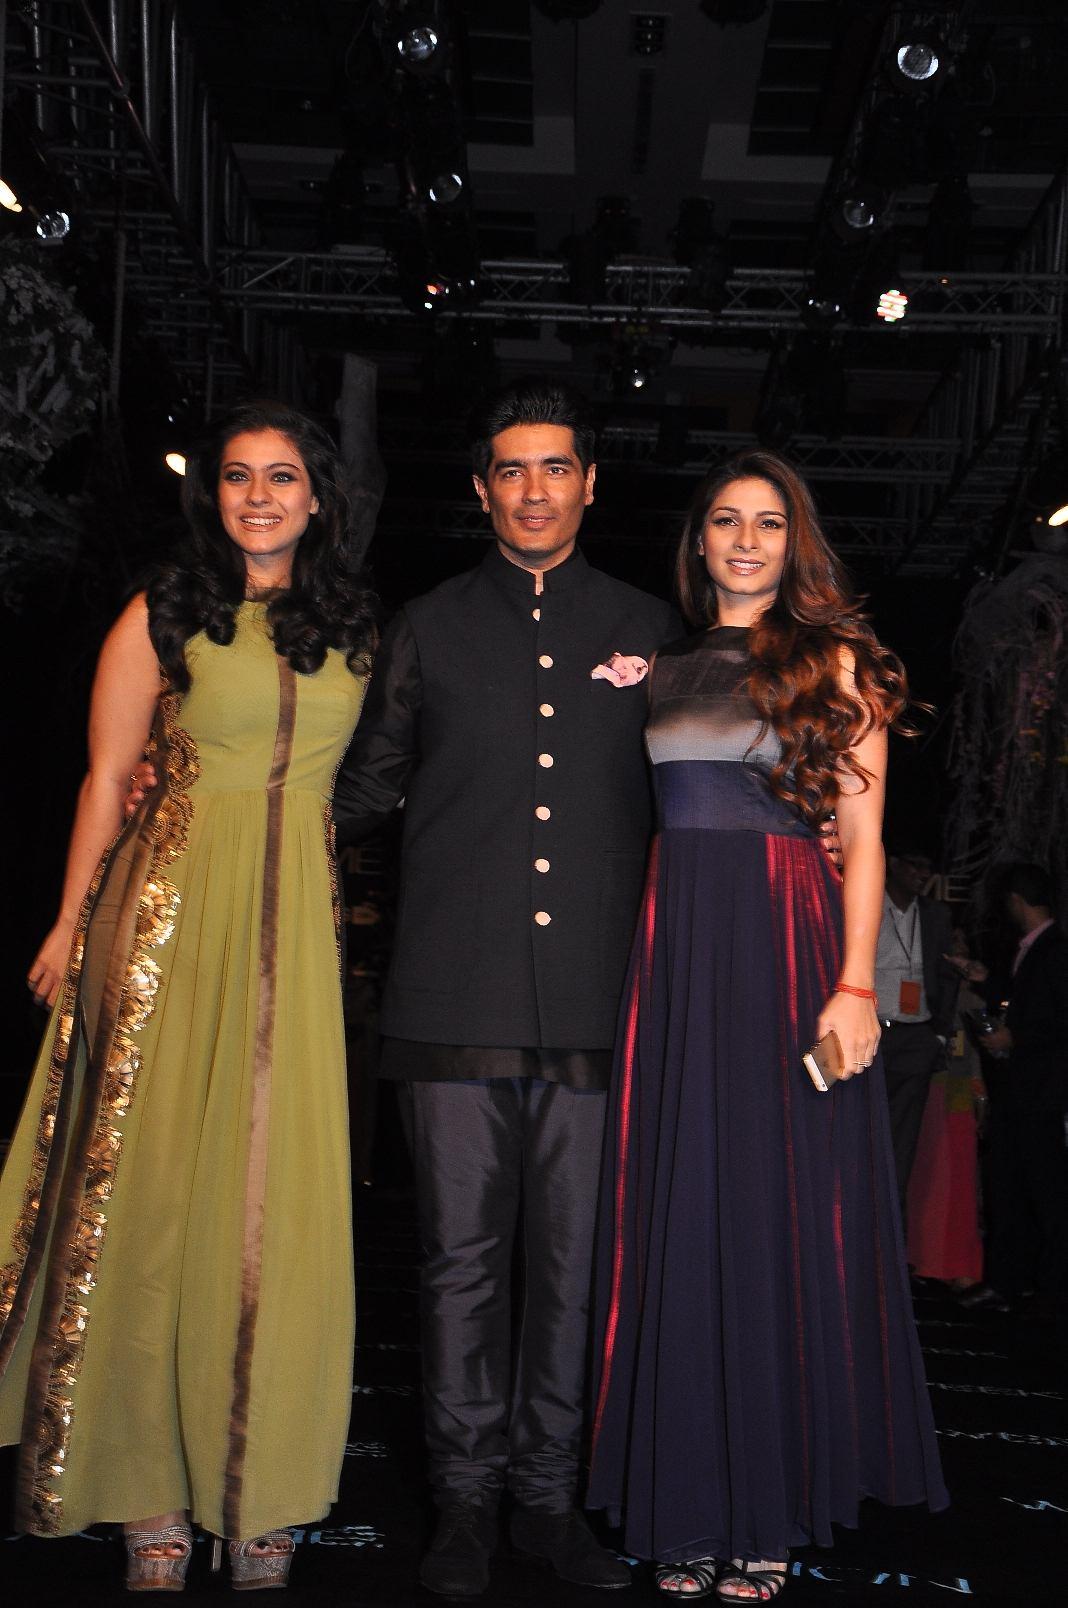 Kajol, Manish Malhotra and Tanisha Mukherjee